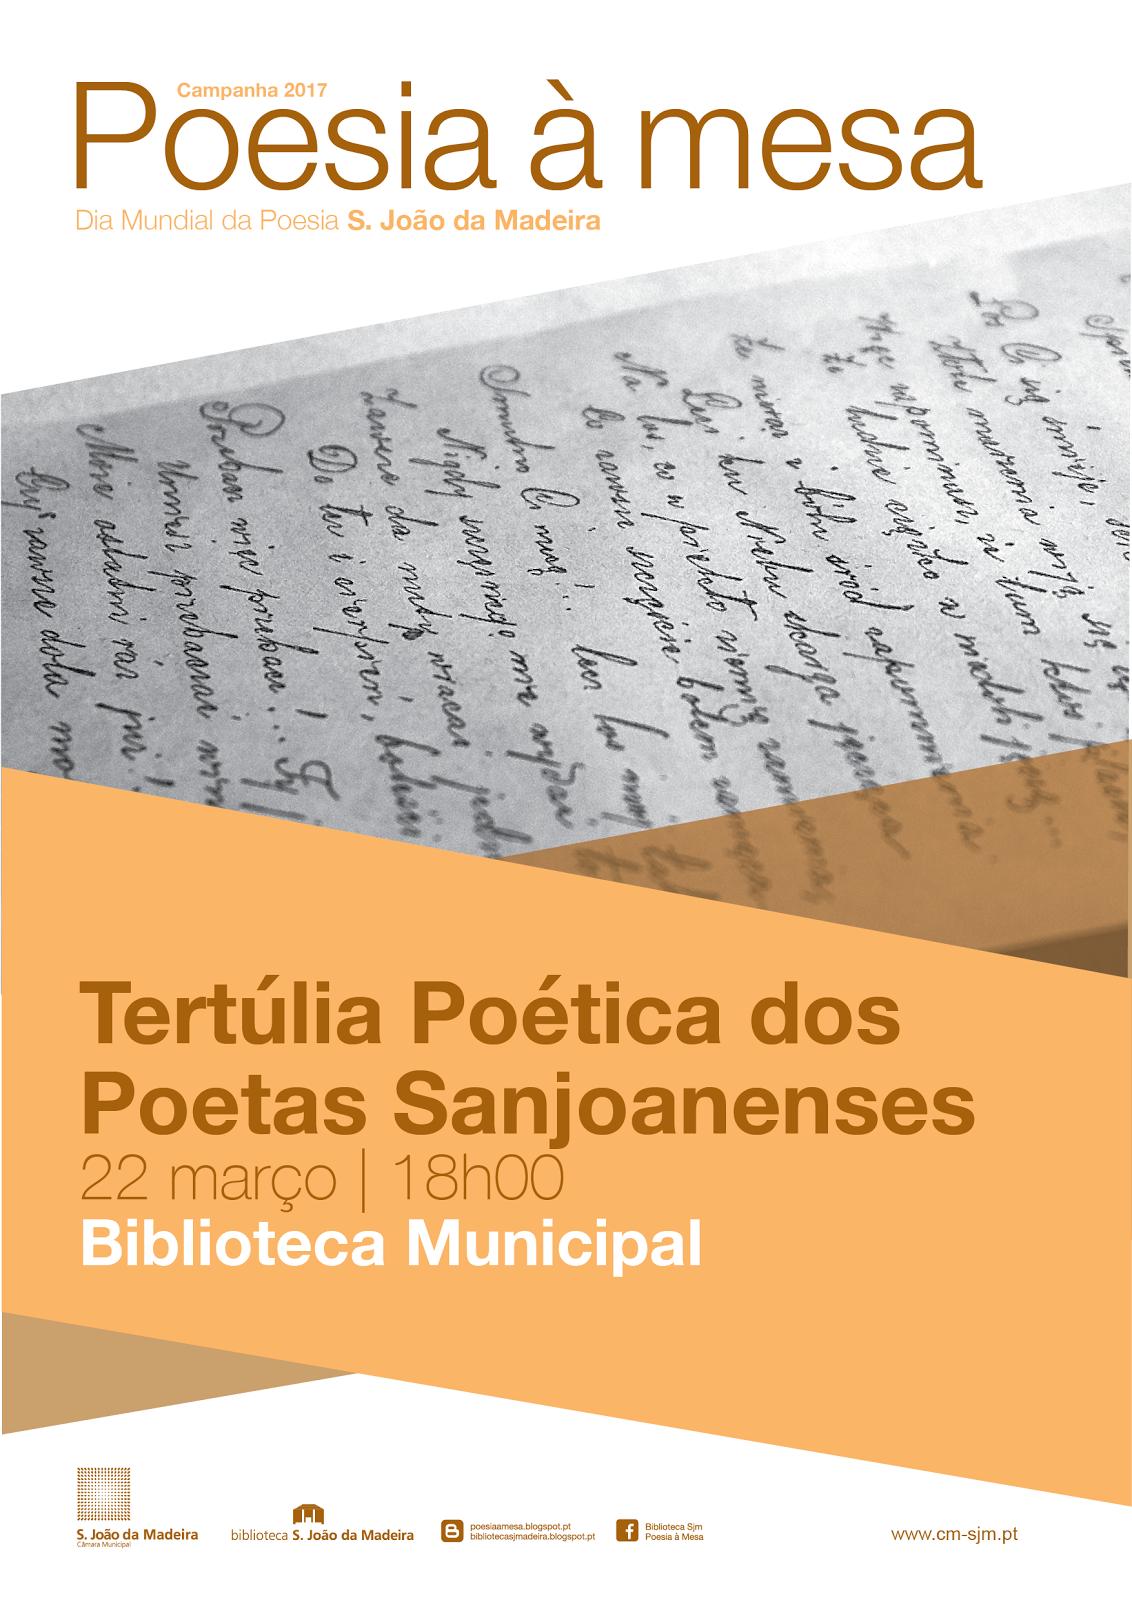 TERTÚLIA DOS POETAS SANJOANENSES, COM PERFORMANCE MUSICAL DOS ALUNOS  DA ACADEMIA DE MÚSICA